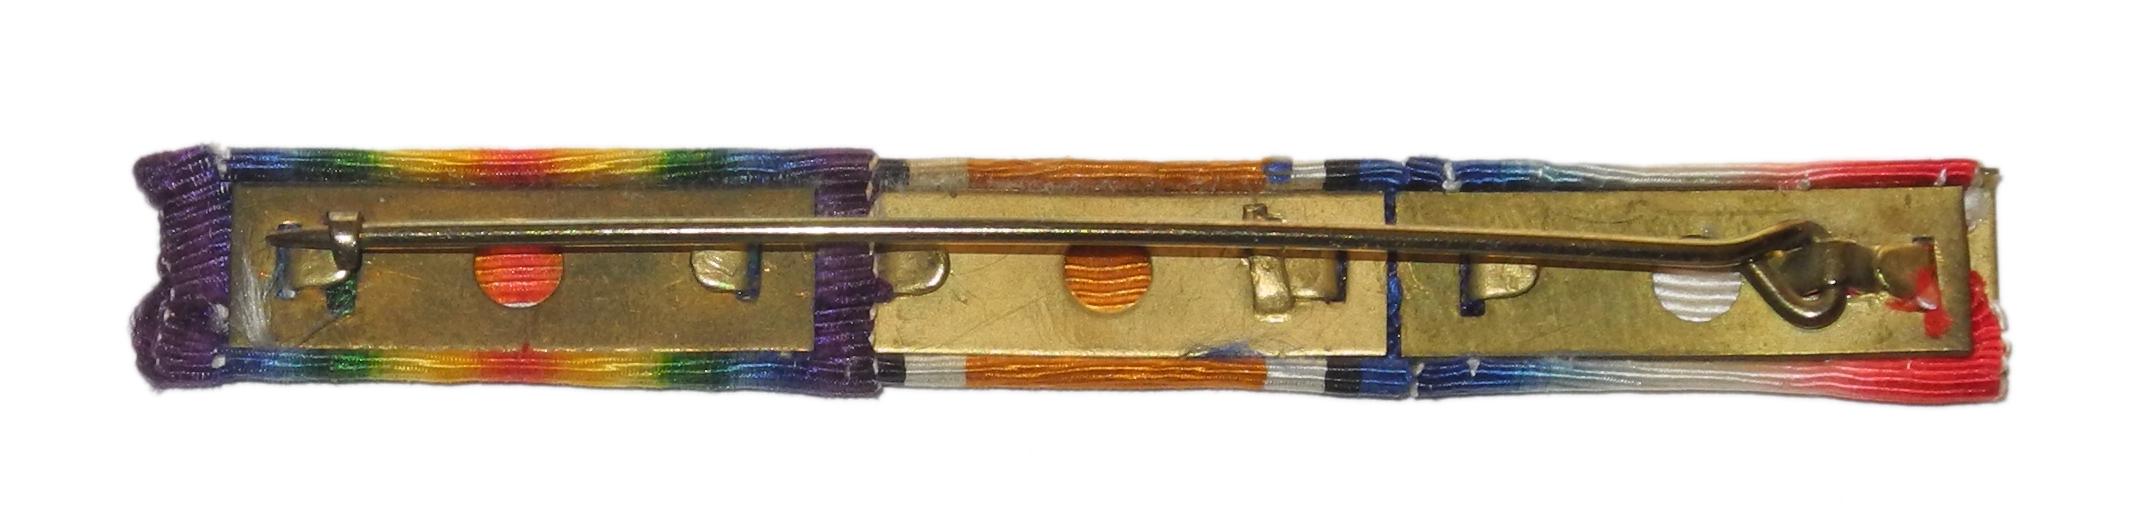 WWI medal ribbons on pinback bar